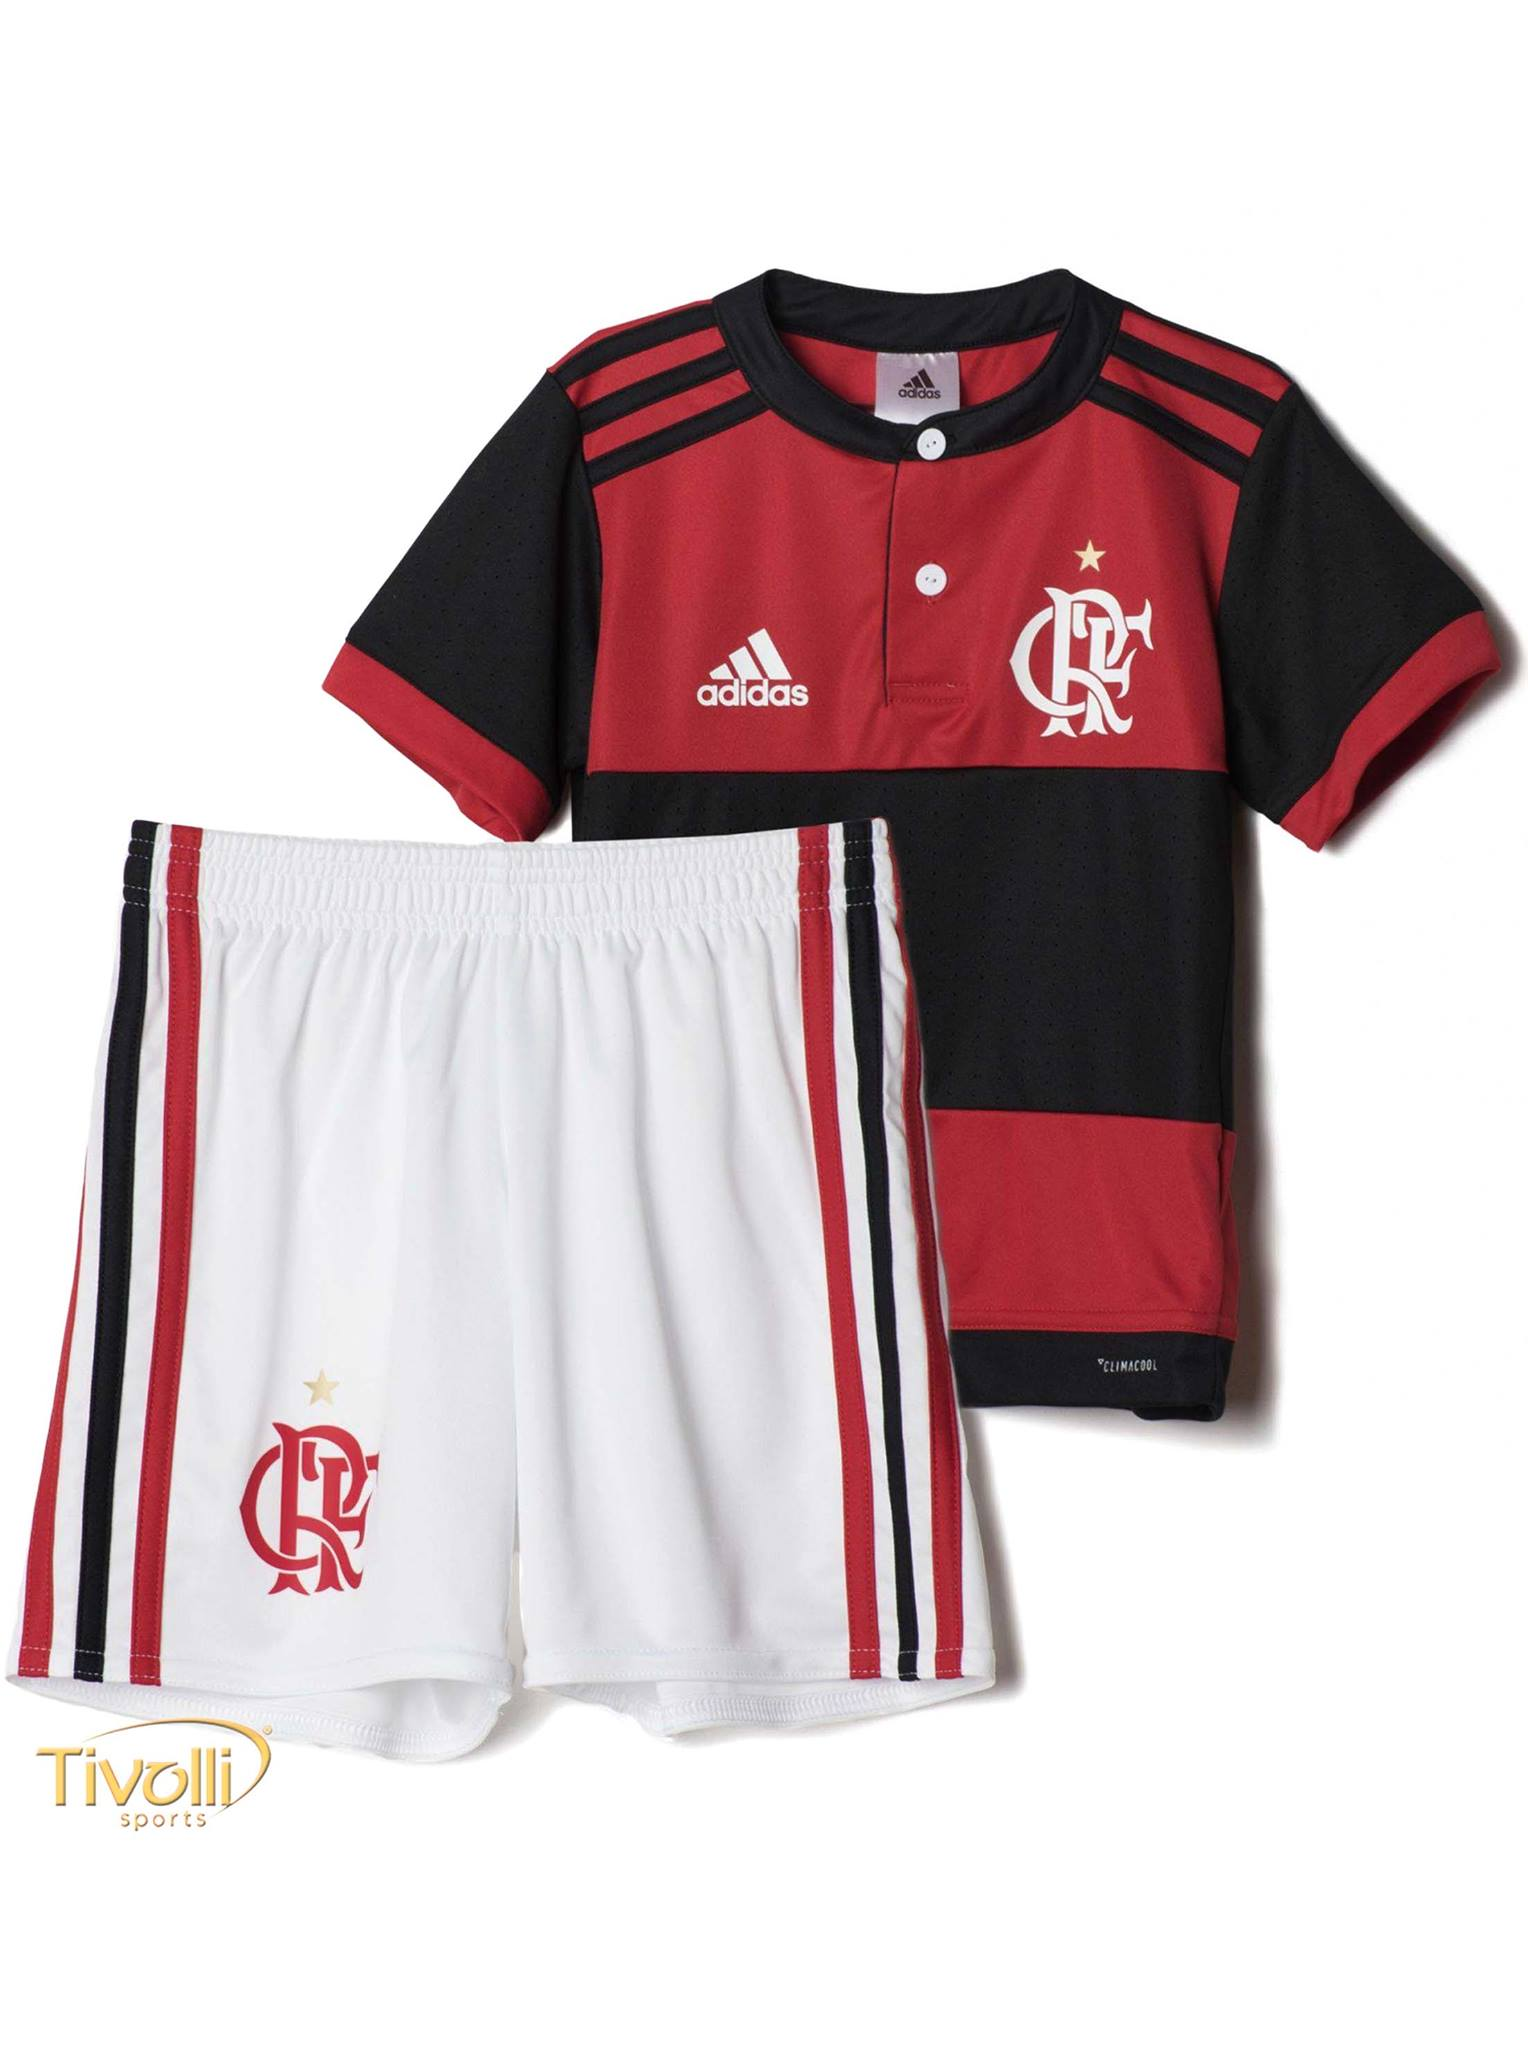 Mini Kit Flamengo I Home 2017 2018 Infantil Adidas     8f9e7976b5153